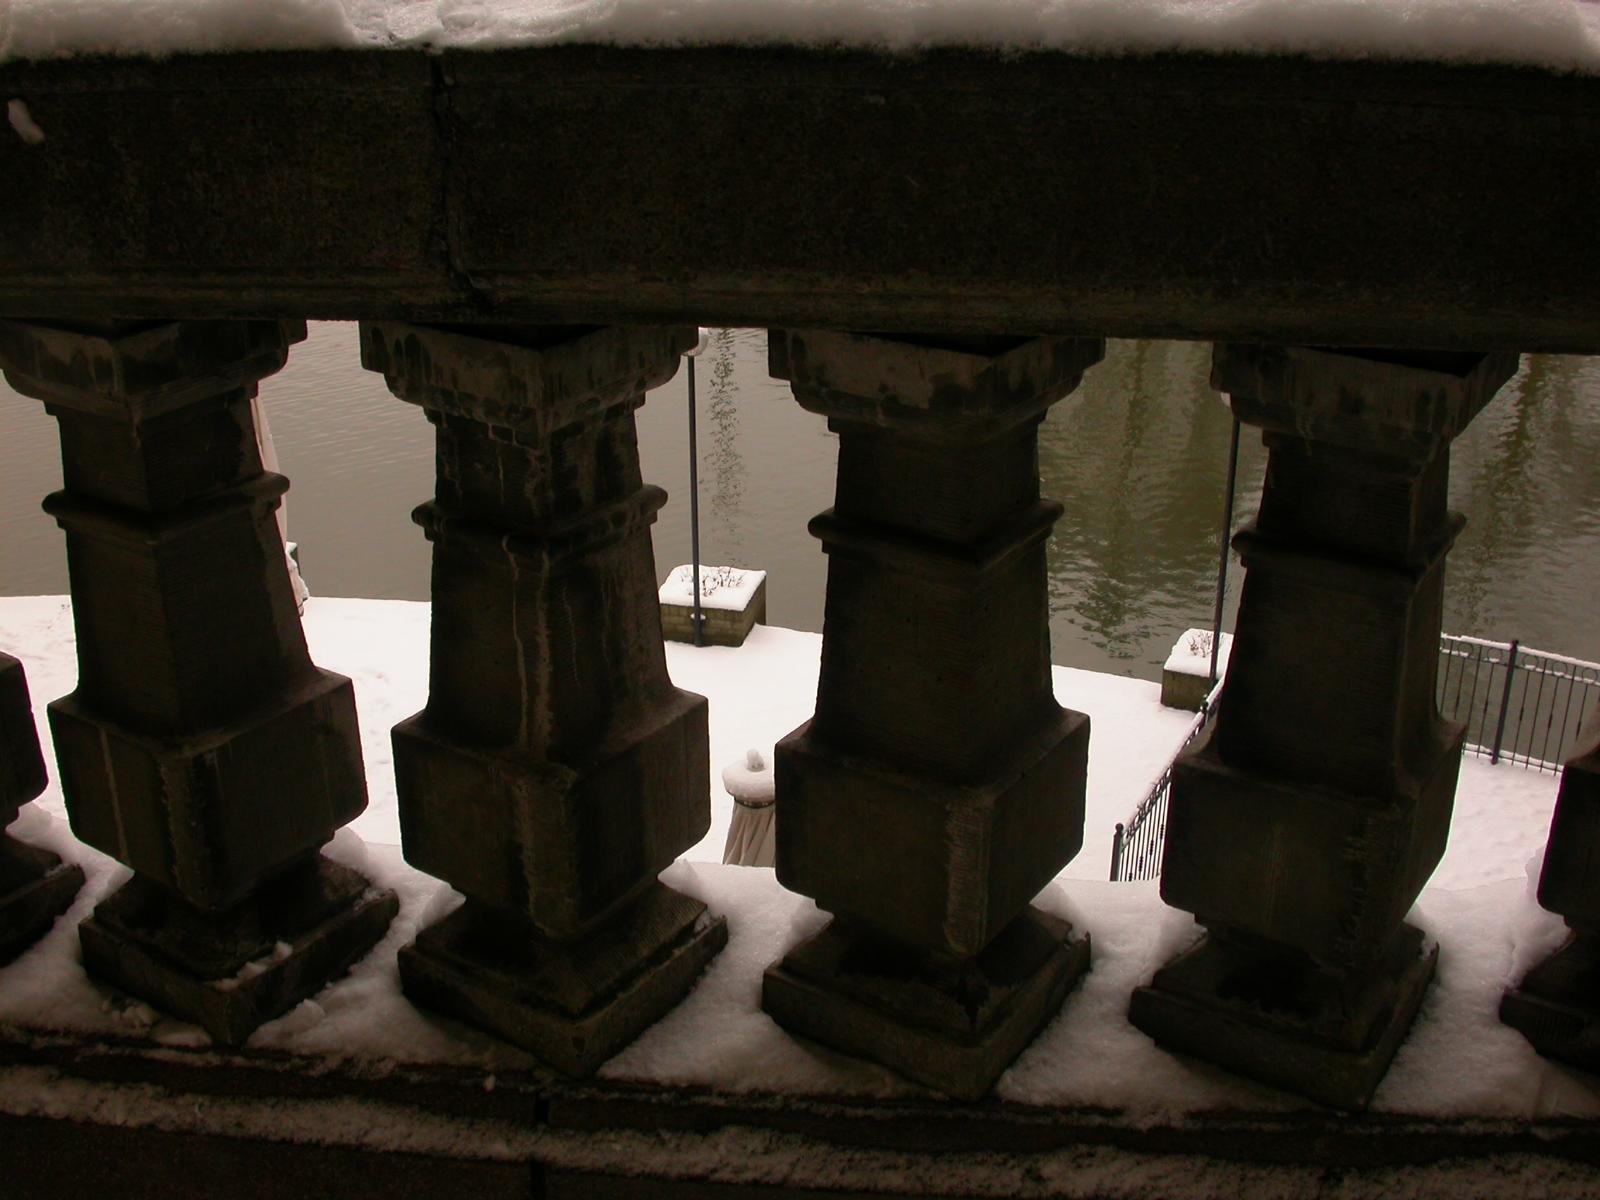 eva balcony railing stone ornate